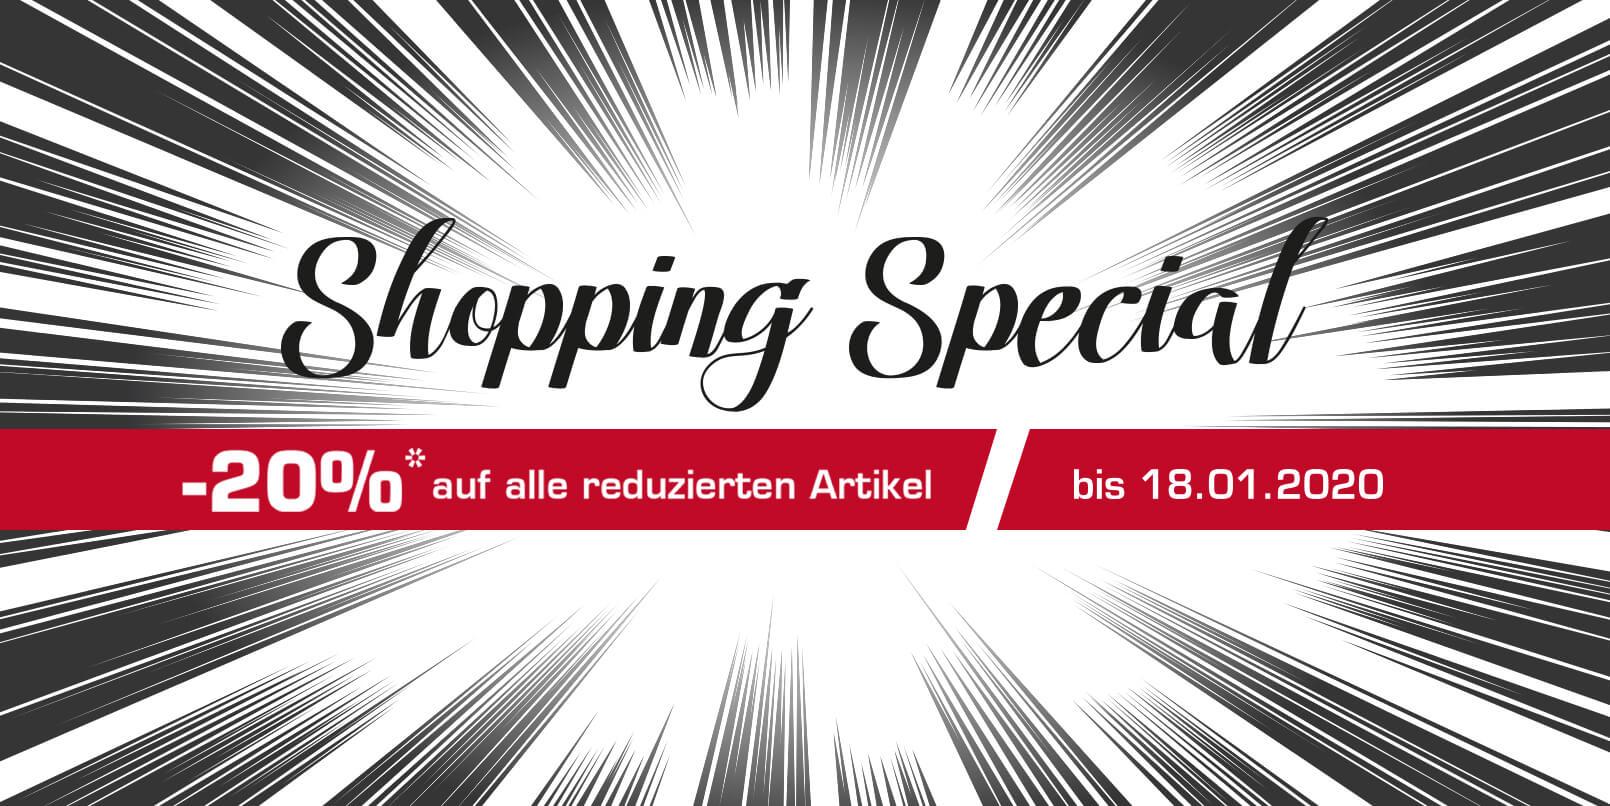 Shopping Special in Landshut & Ludwigsburg